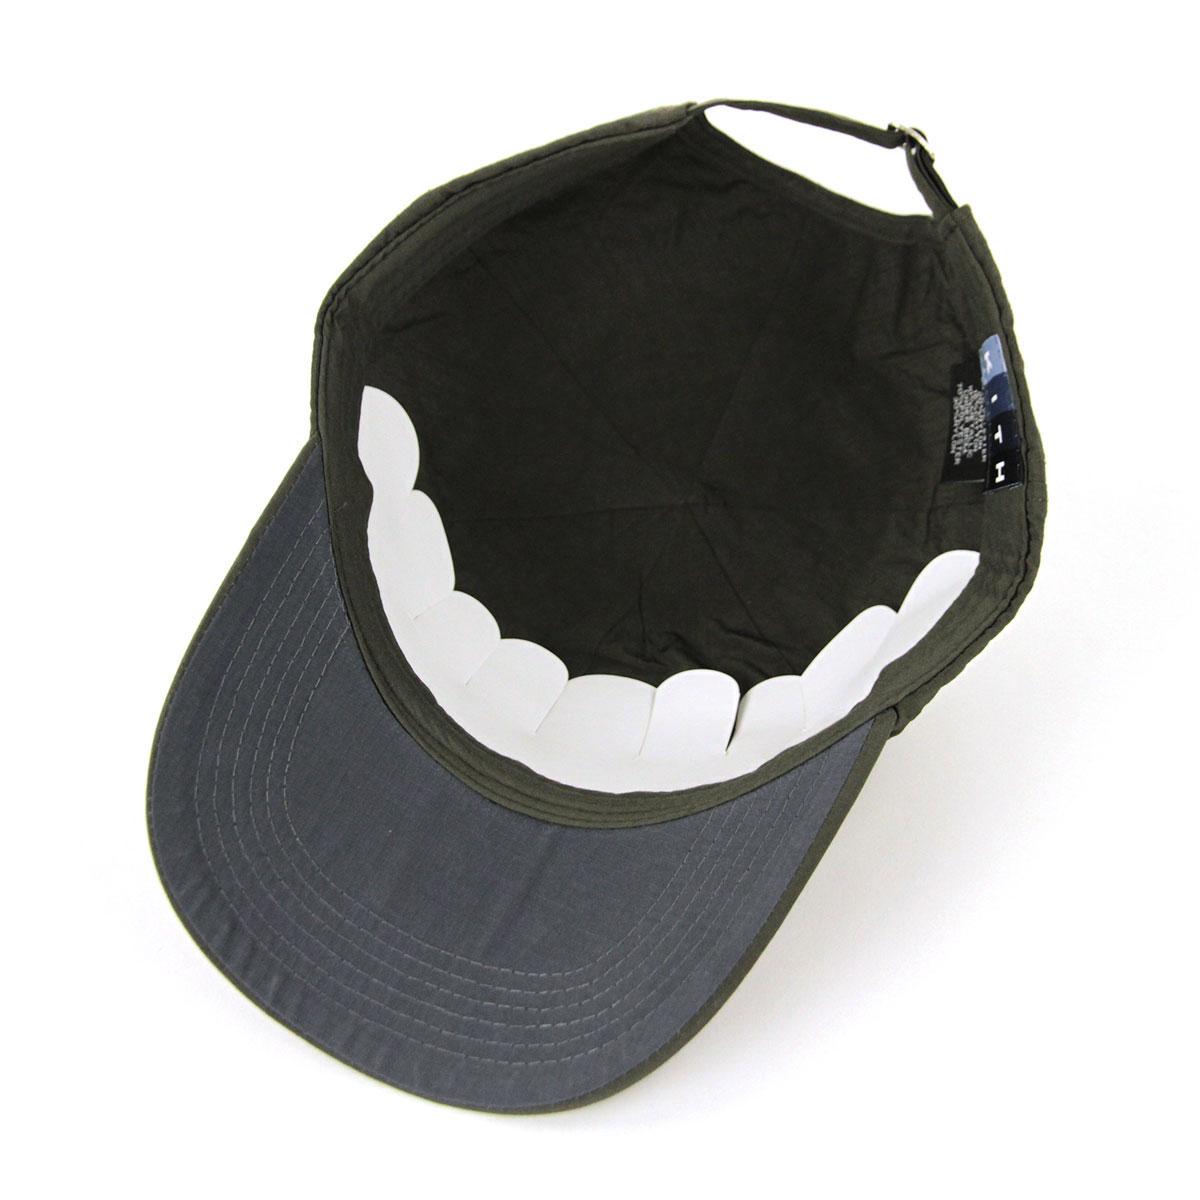 aa36db513 Kiss cap men's regular article KITH hat hat KITH UTILITY DAD HAT CAP  KH5024-106 BLACK OLIVE